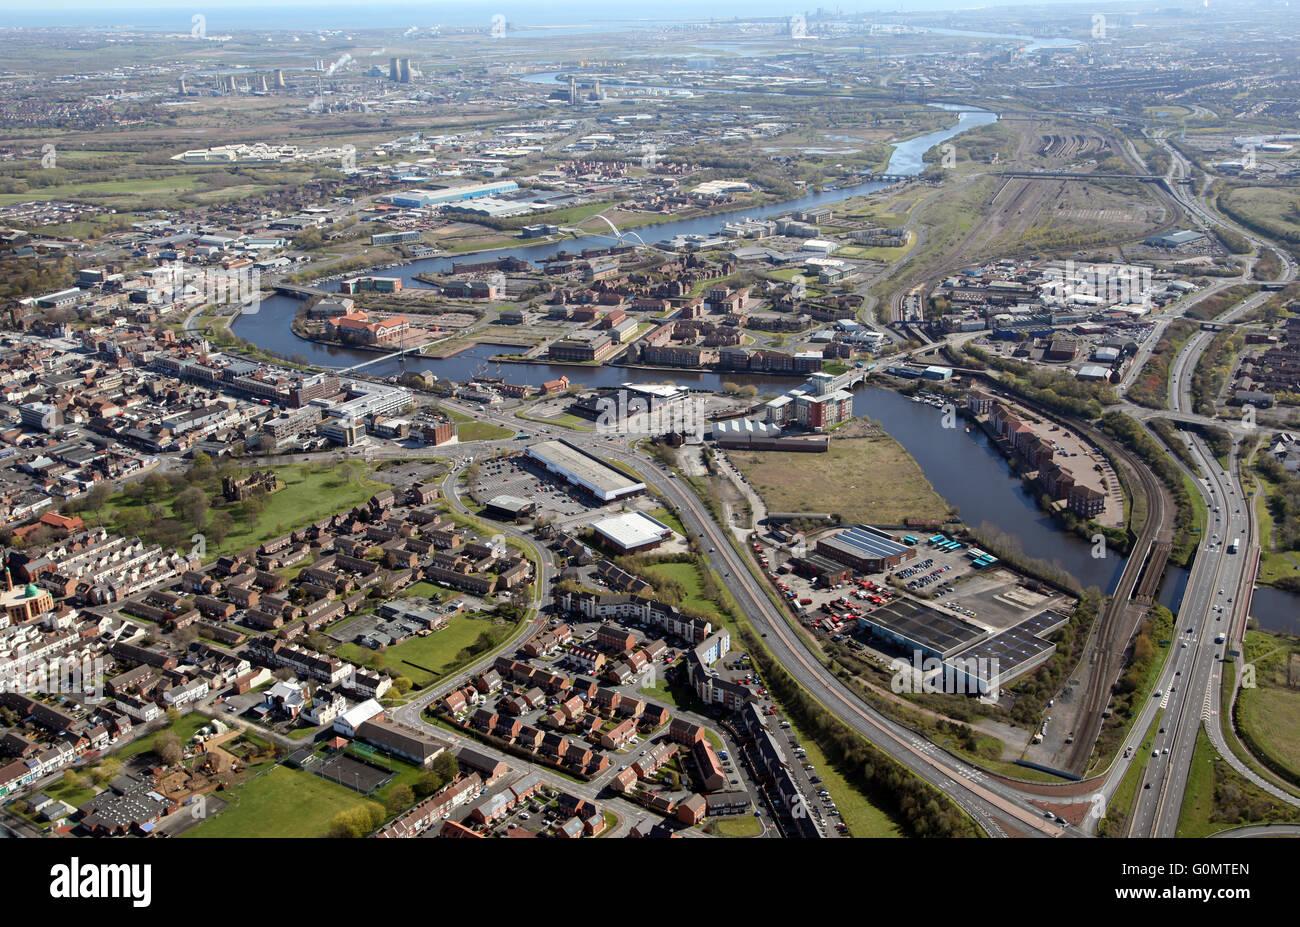 Vista aérea de Stockton-on-Tees con la A66 & río Tees prominentes, UK Foto de stock